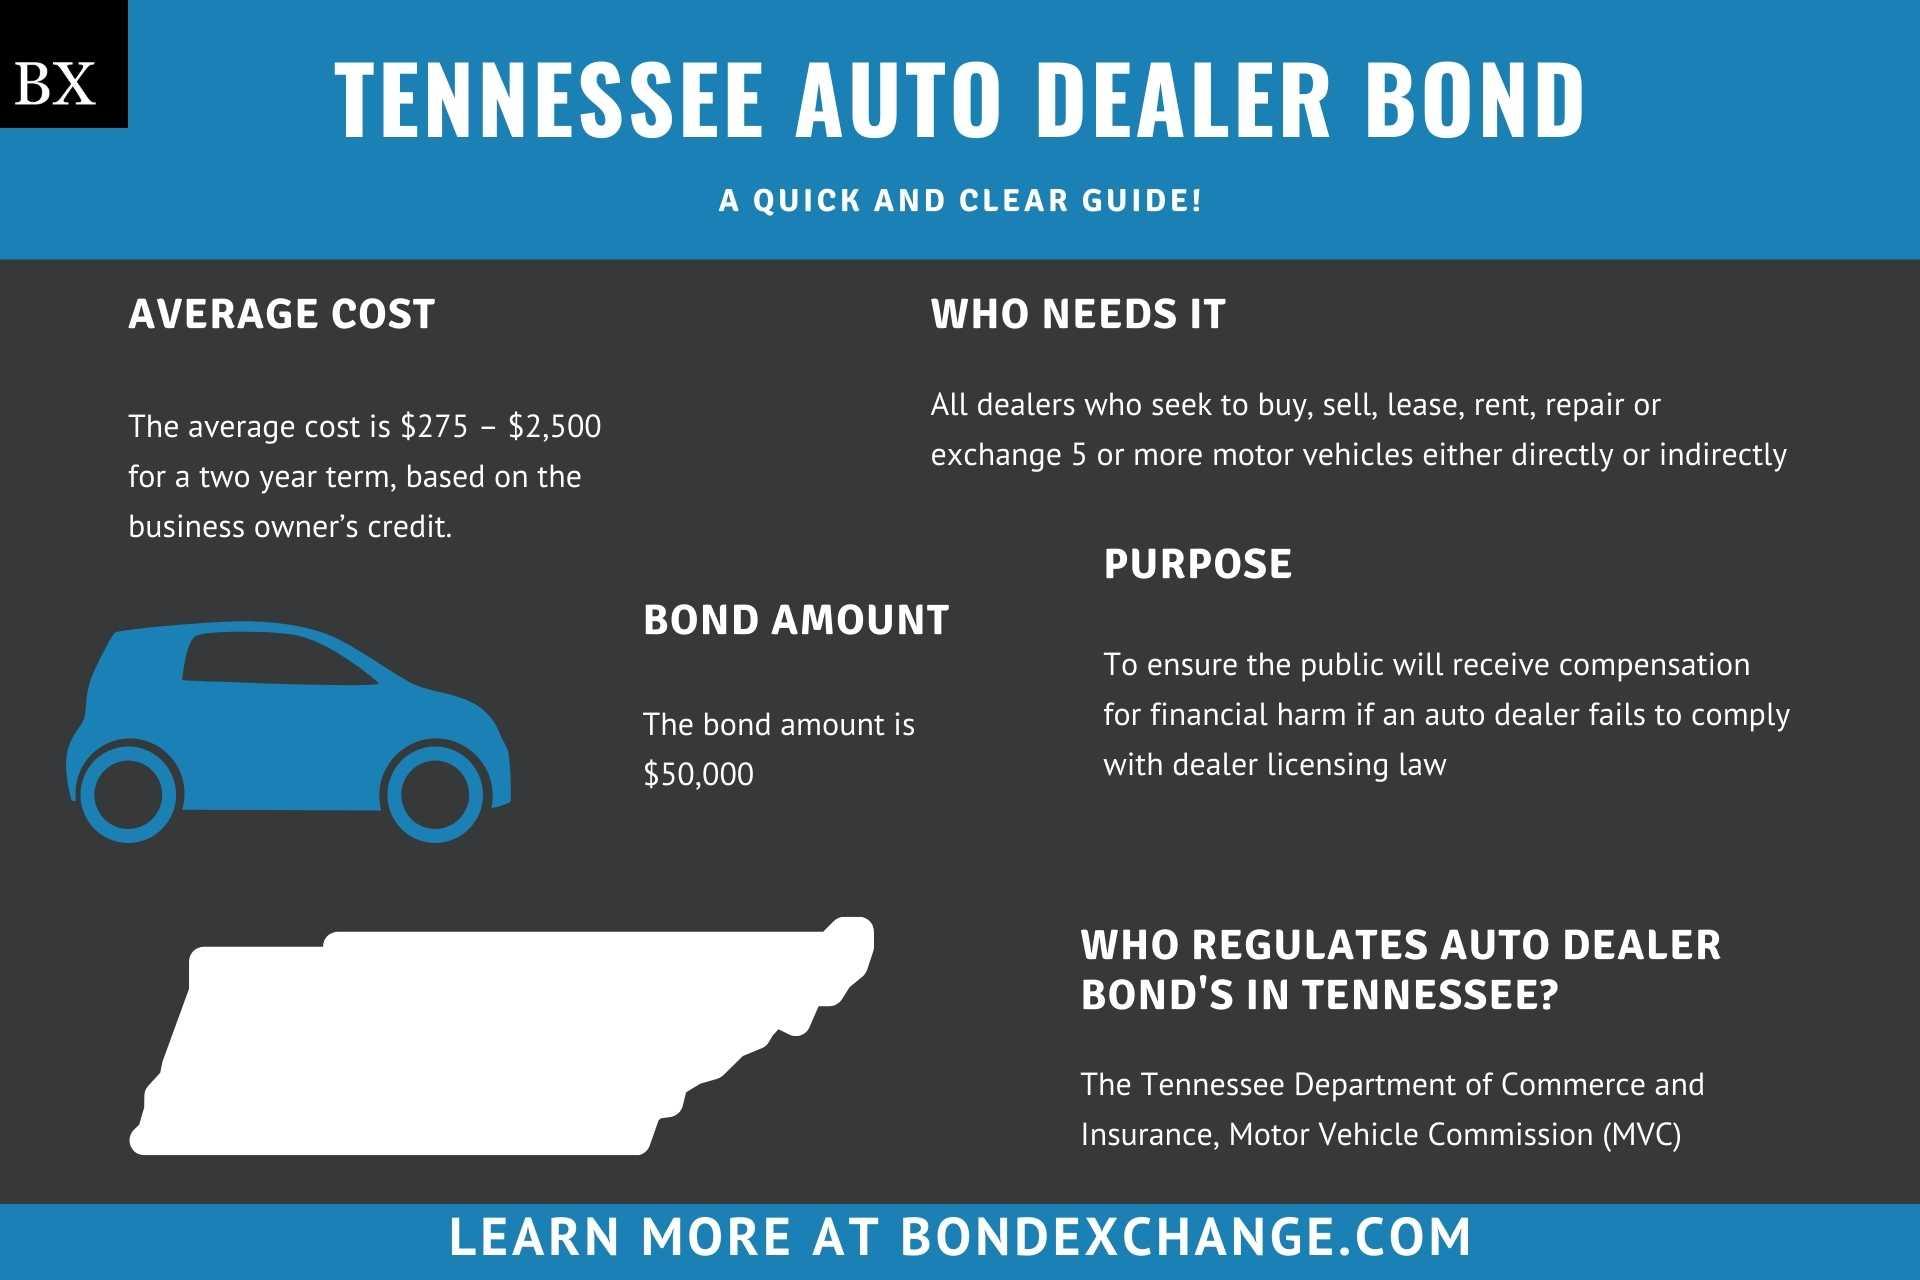 Tennessee Auto Dealer Bond